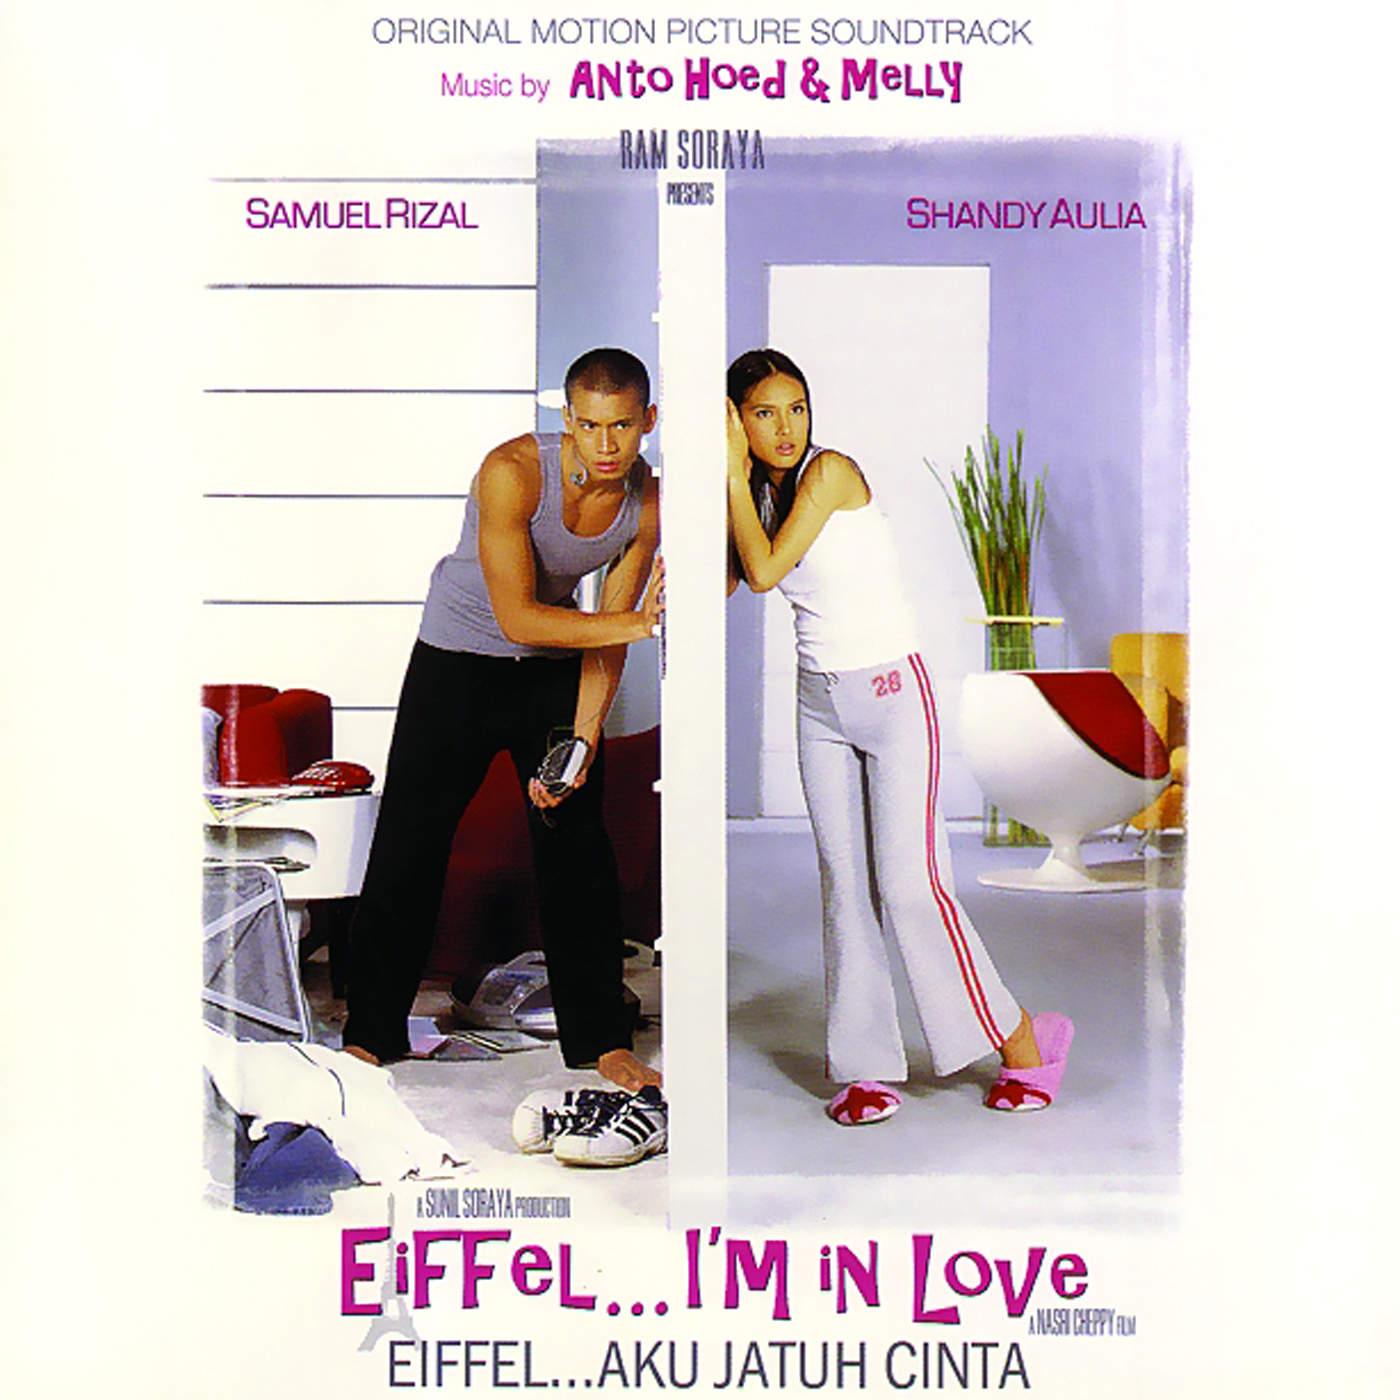 melly goeslaw   ost eiffel i m in love full album 2003